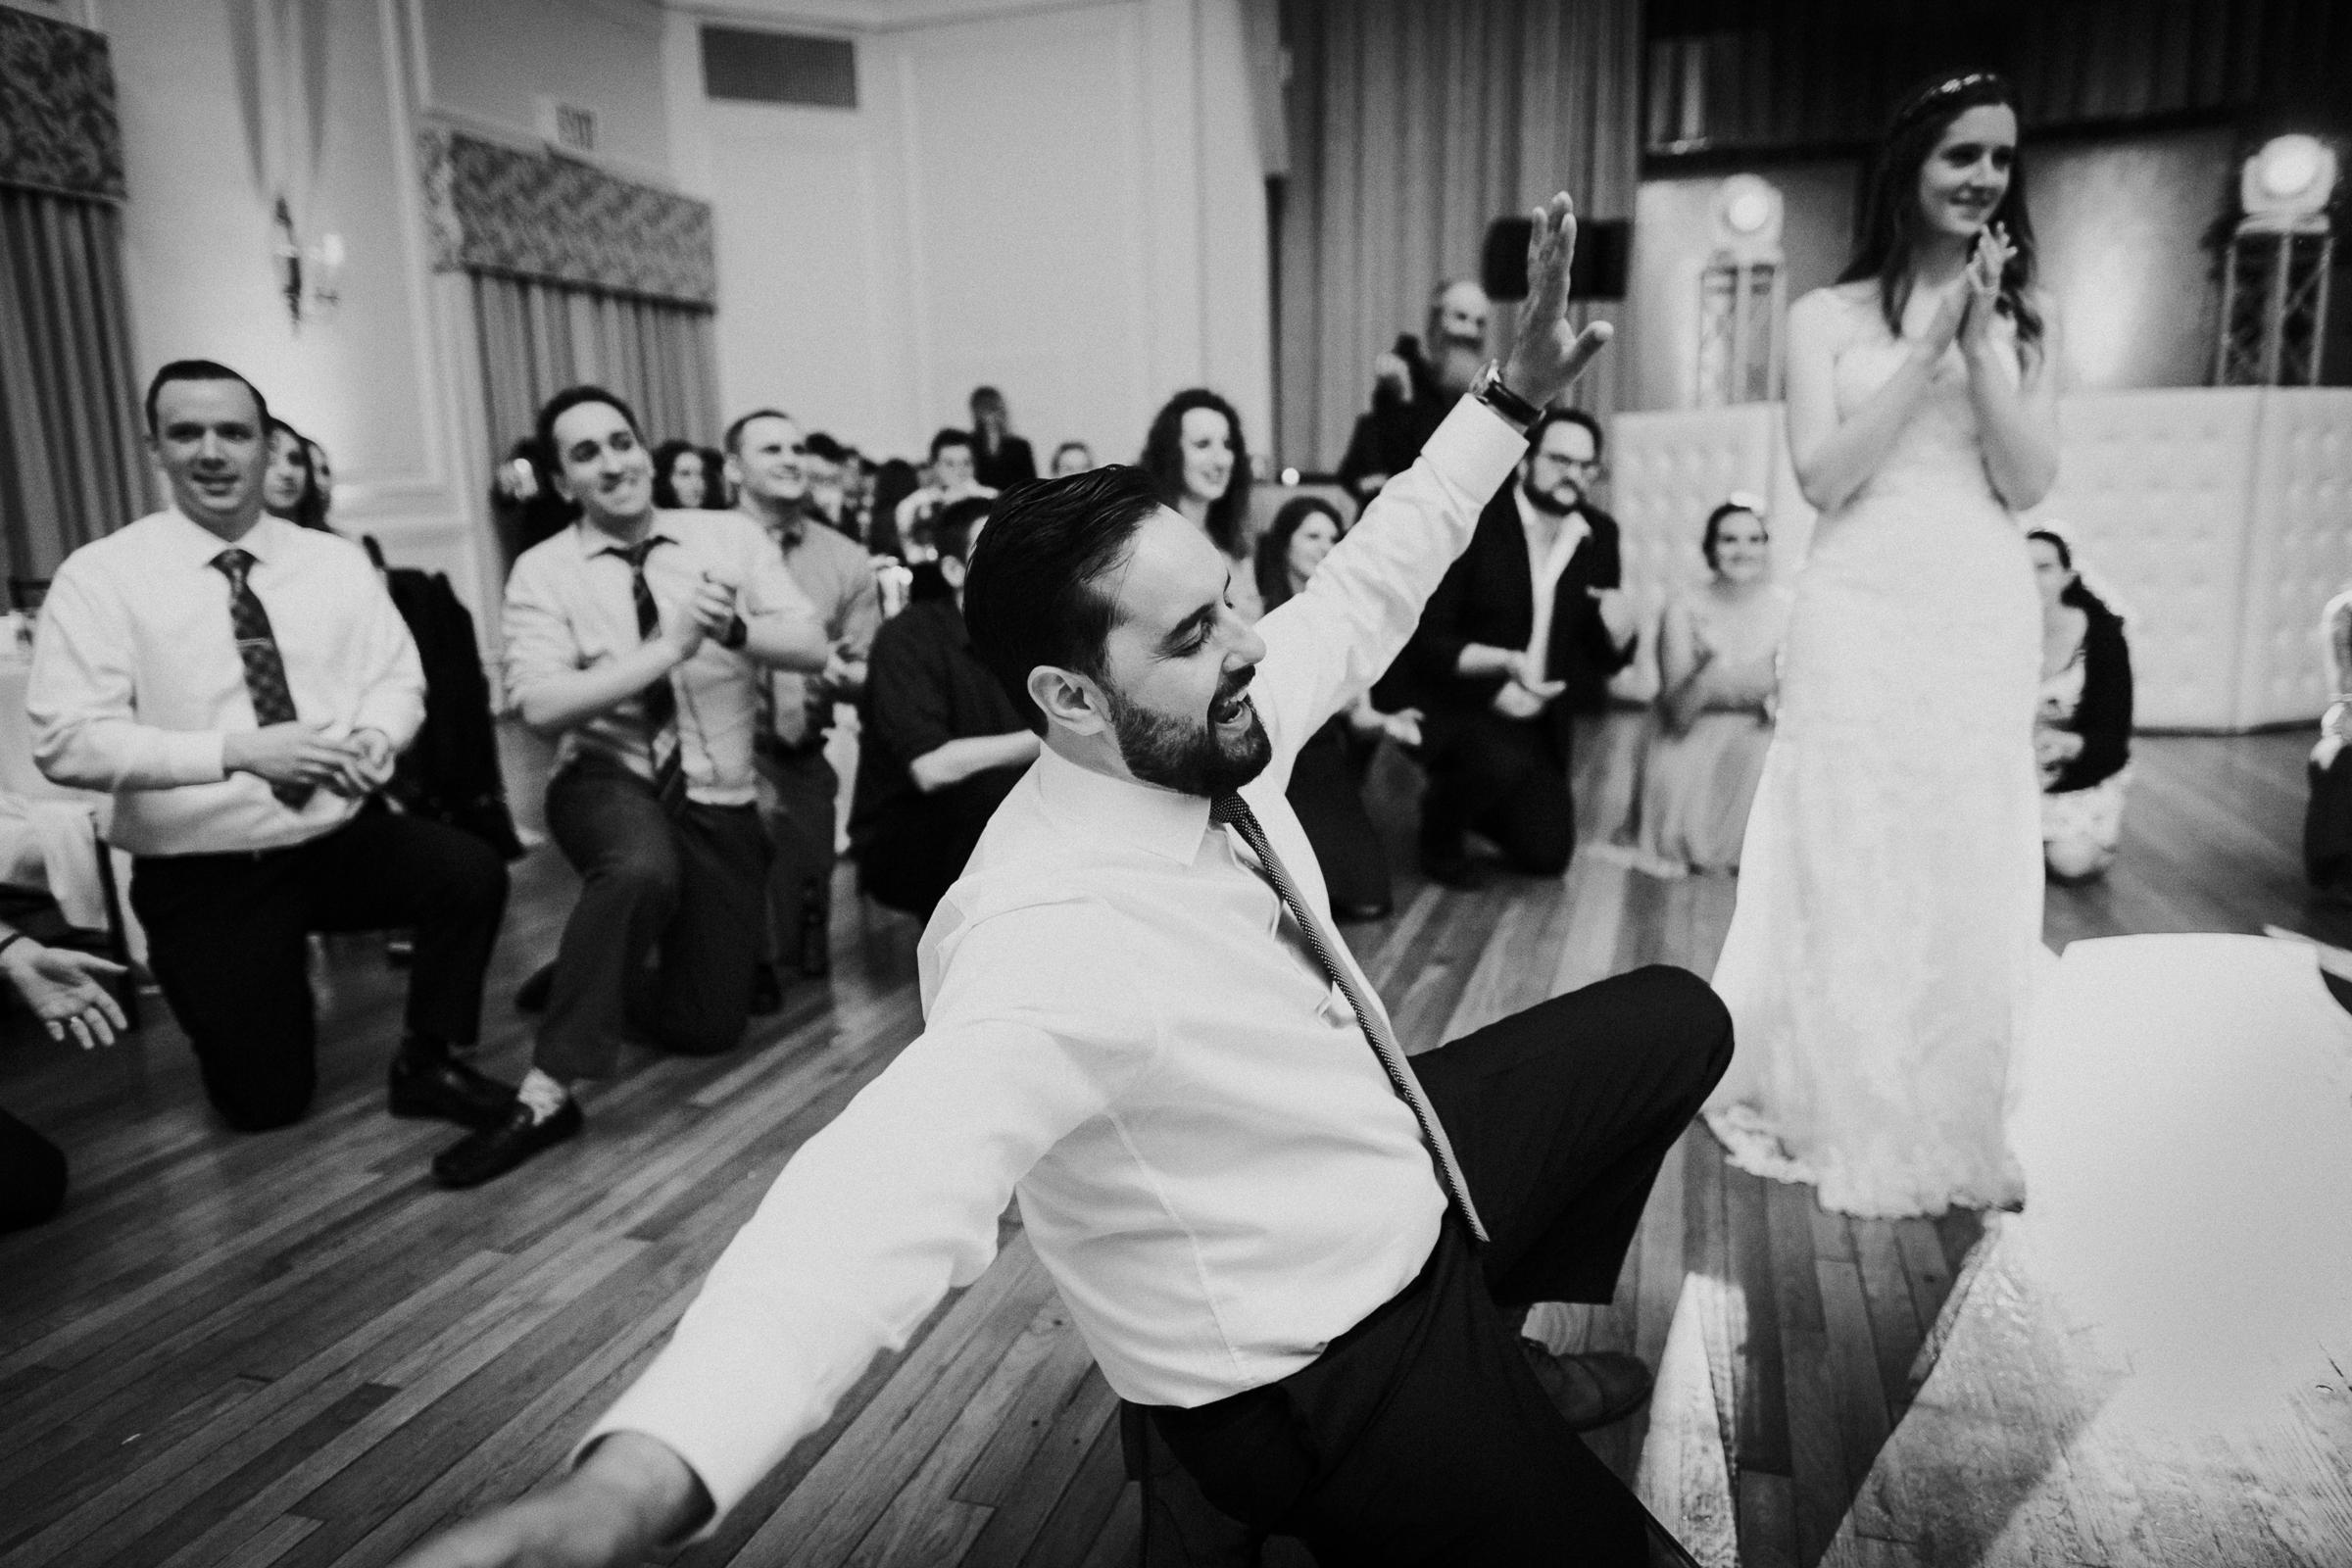 New-York-Documentary-Wedding-Photography-Best-Of-2017-by-Elvira-Kalviste-Photography-17.jpg